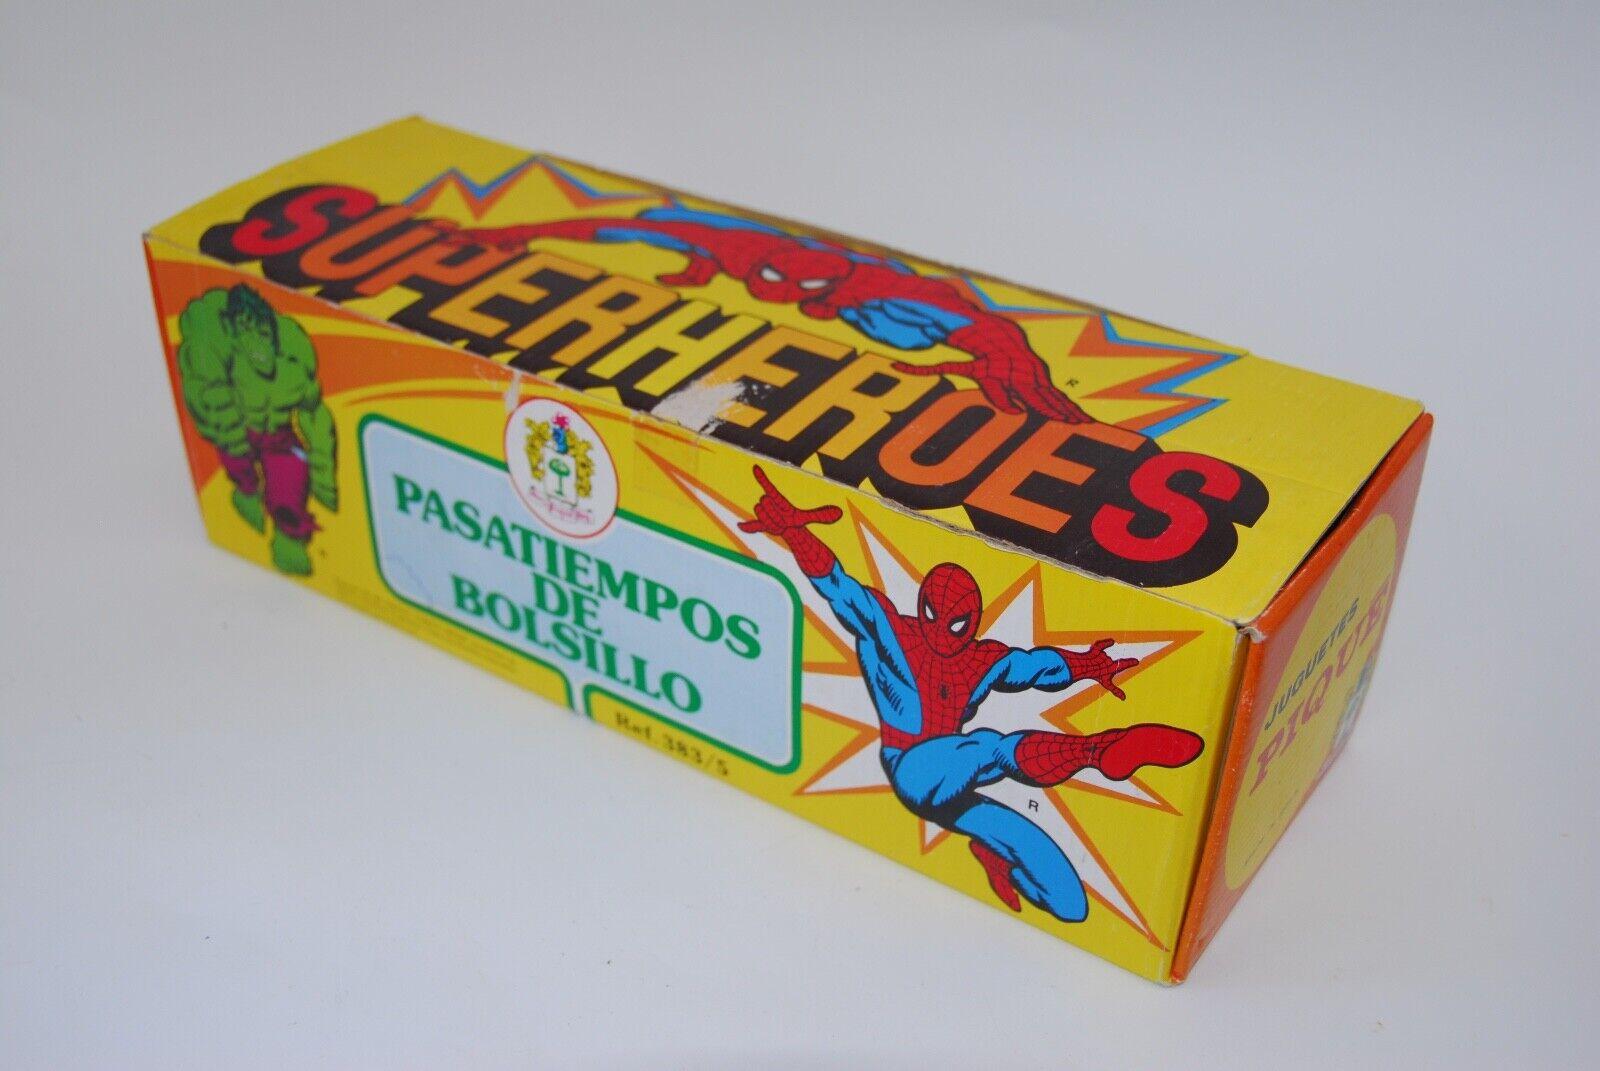 Vintage Marvel Super Heroes Spiderman Hulk Puzzle Games Box